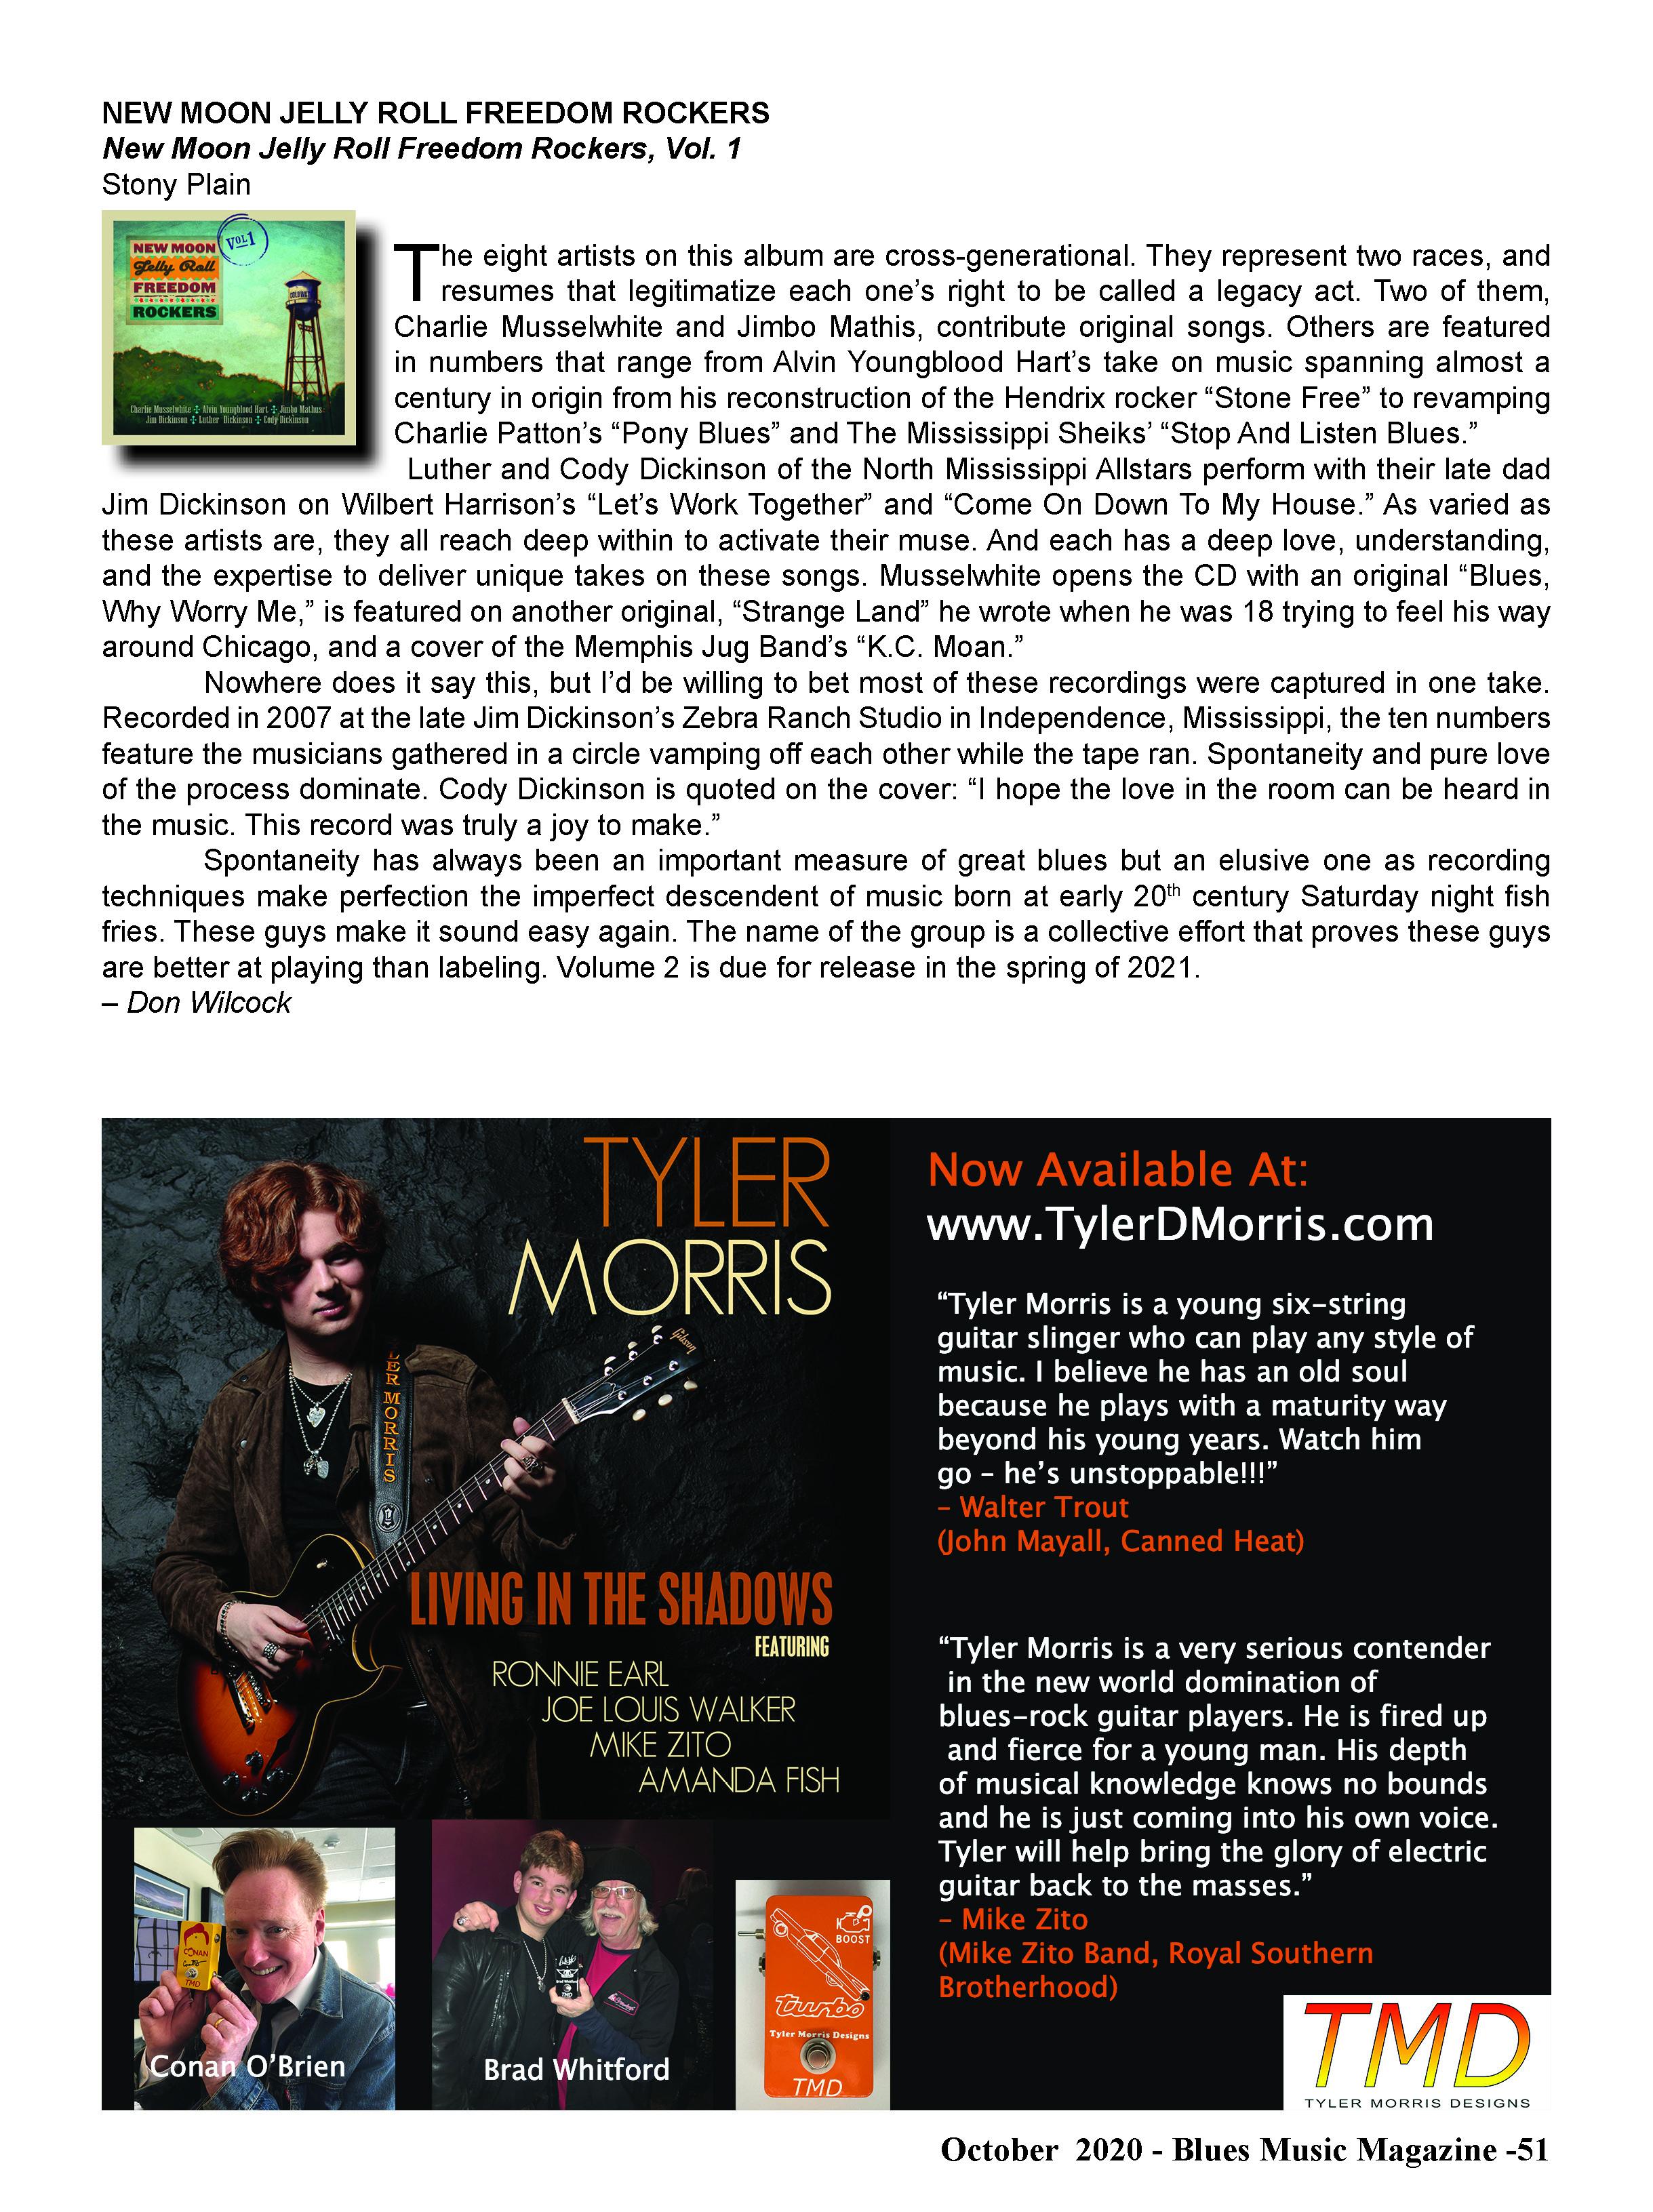 blues-music-magazine-fall-2020-2751.jpg